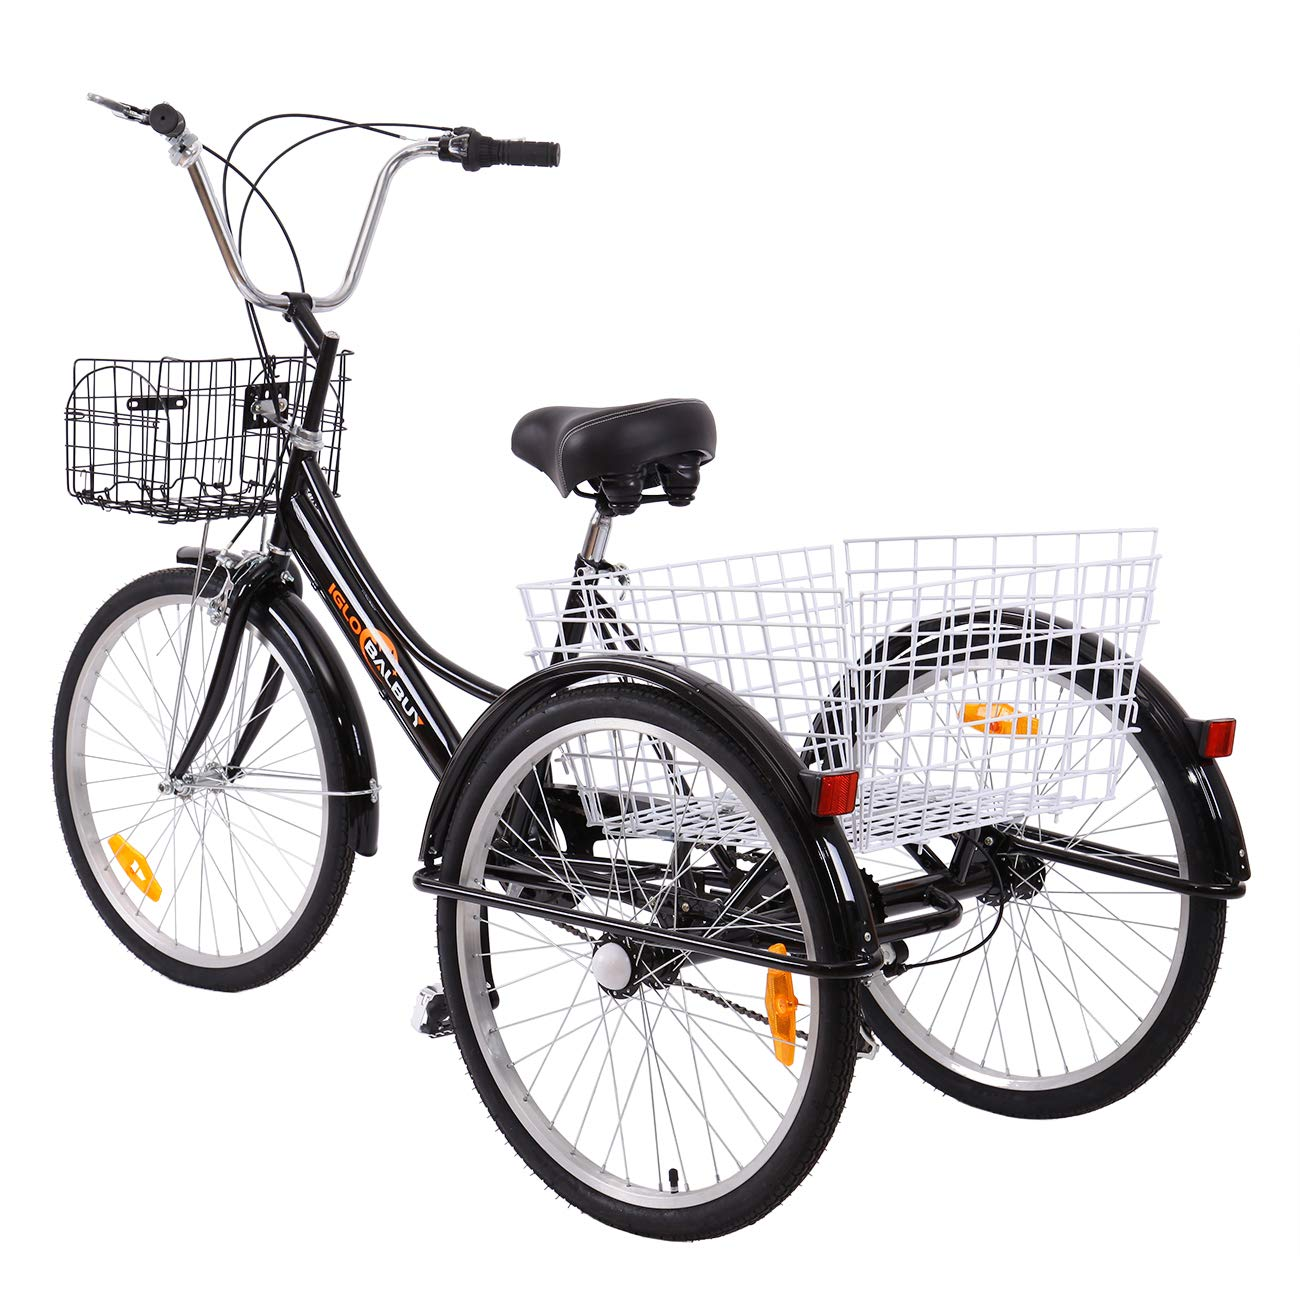 Yonntech Triciclo per Adulti 03